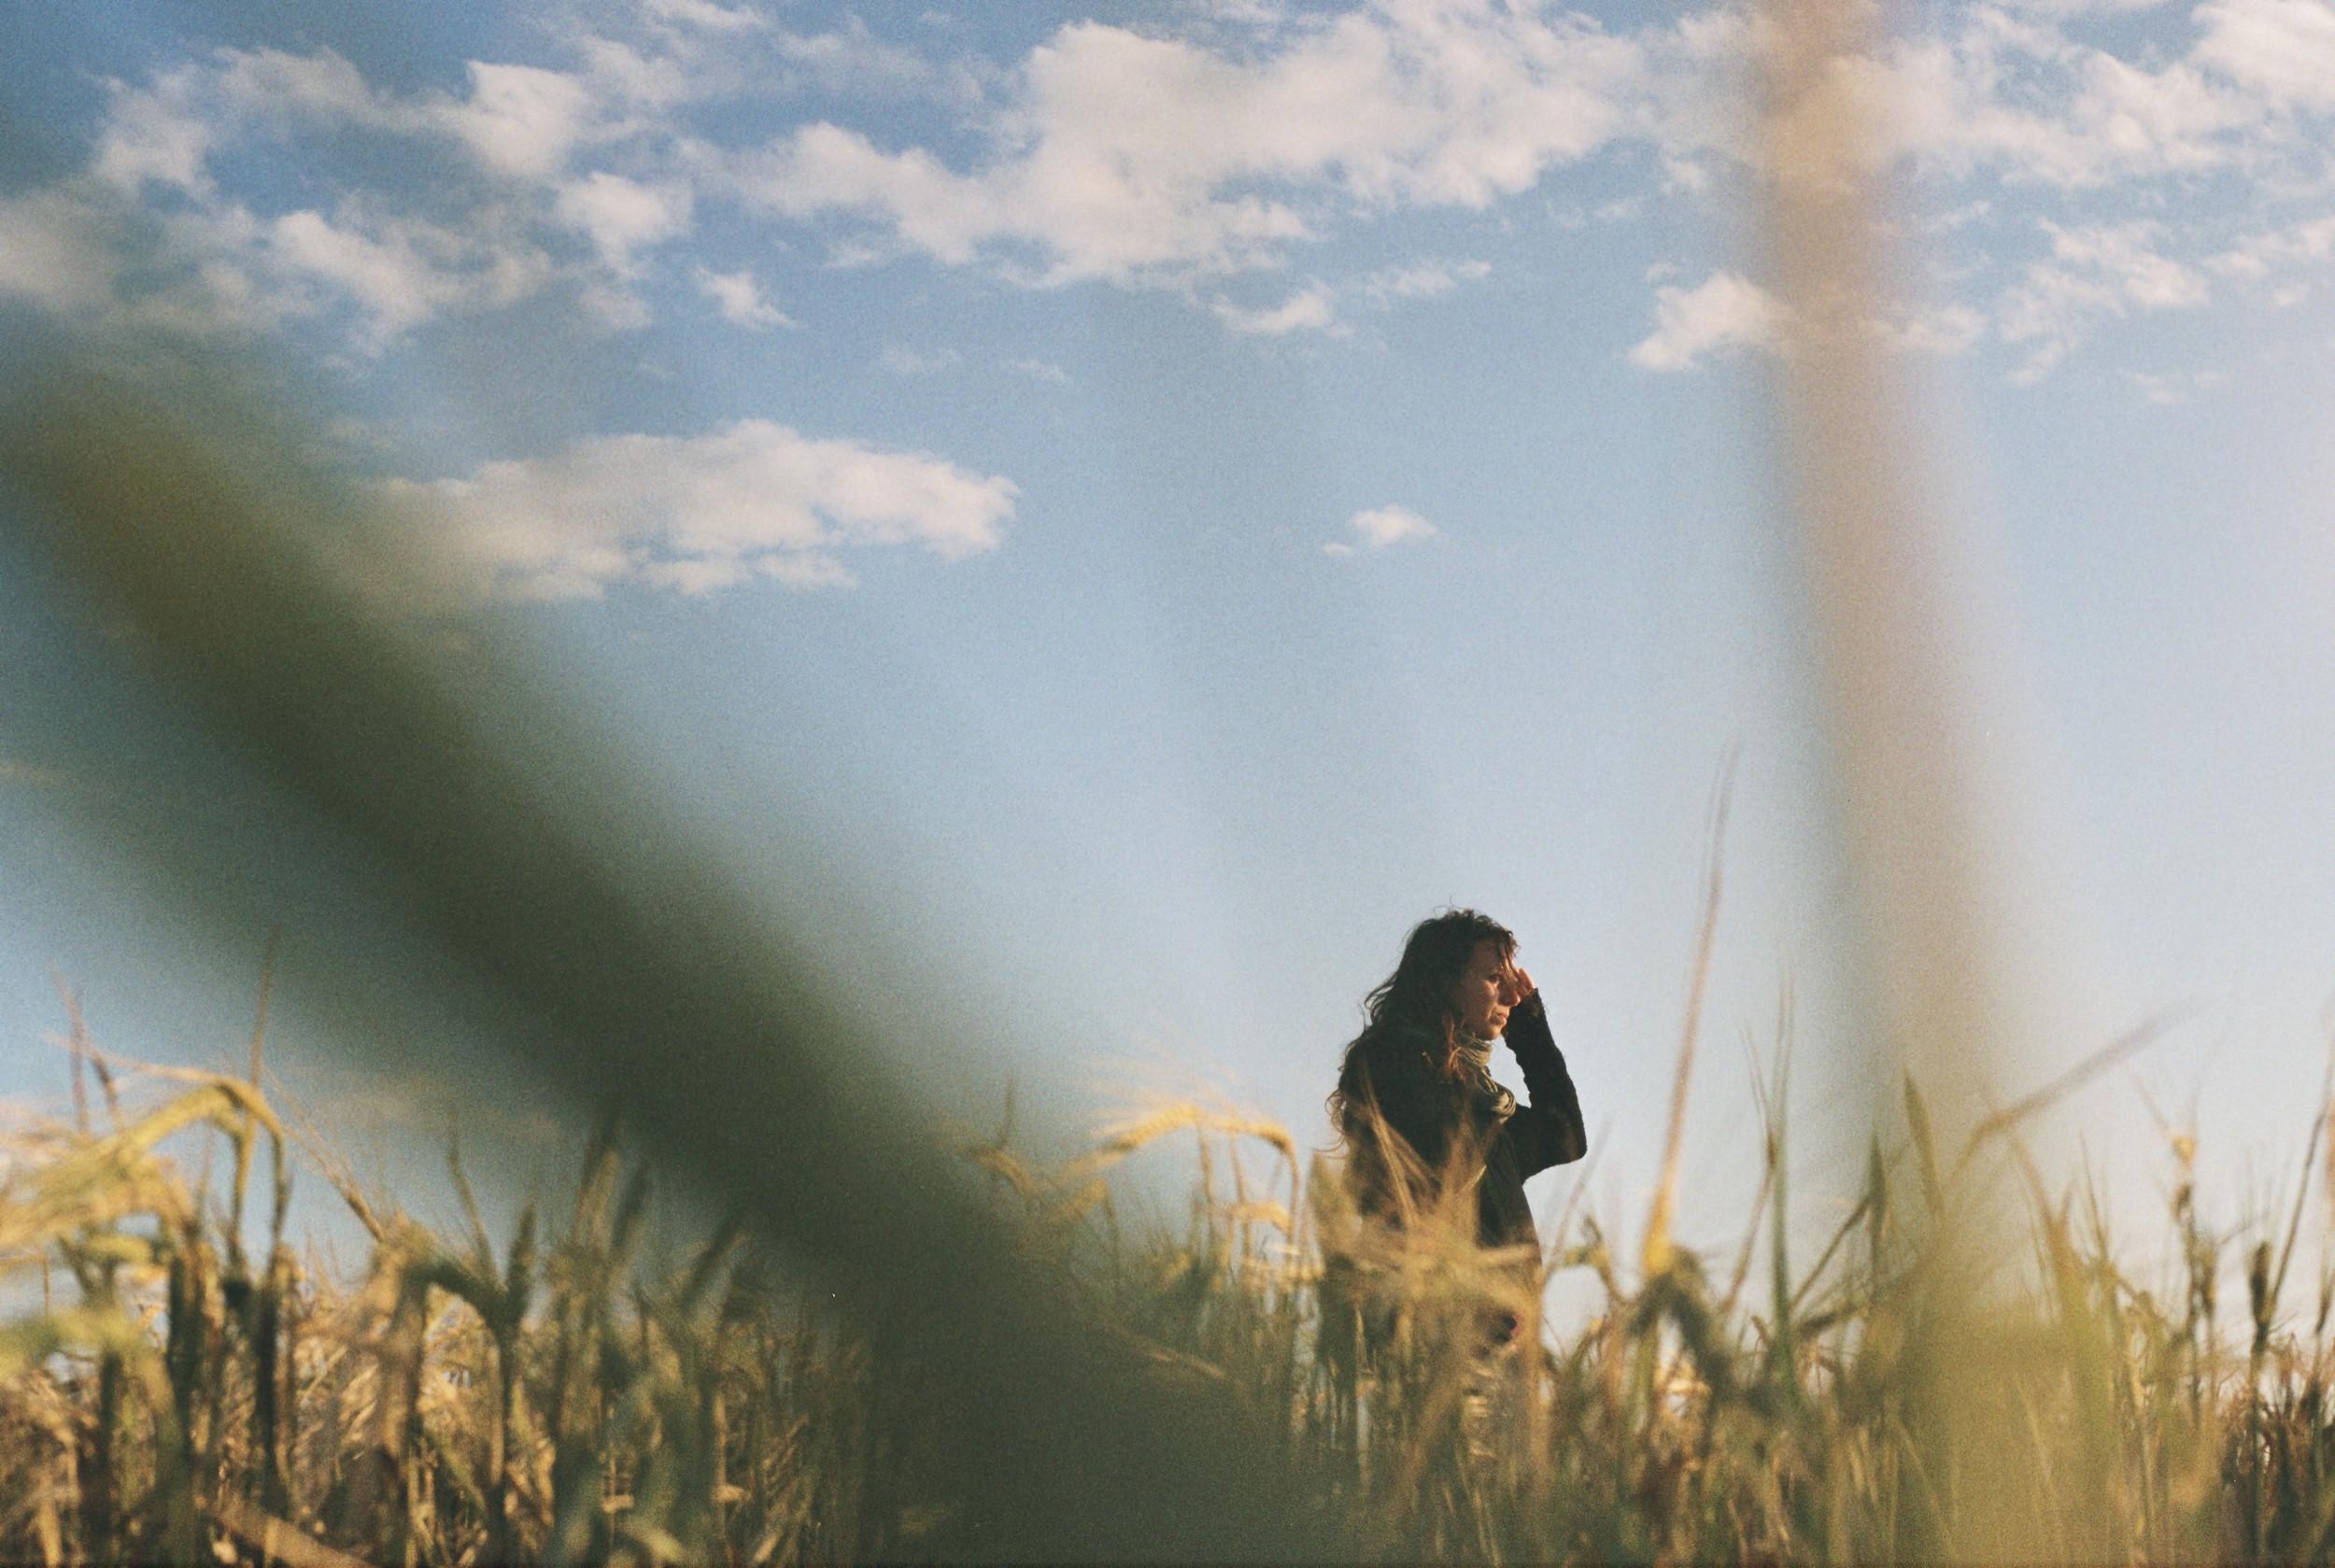 chica-en-campo-de-trigo.jpg